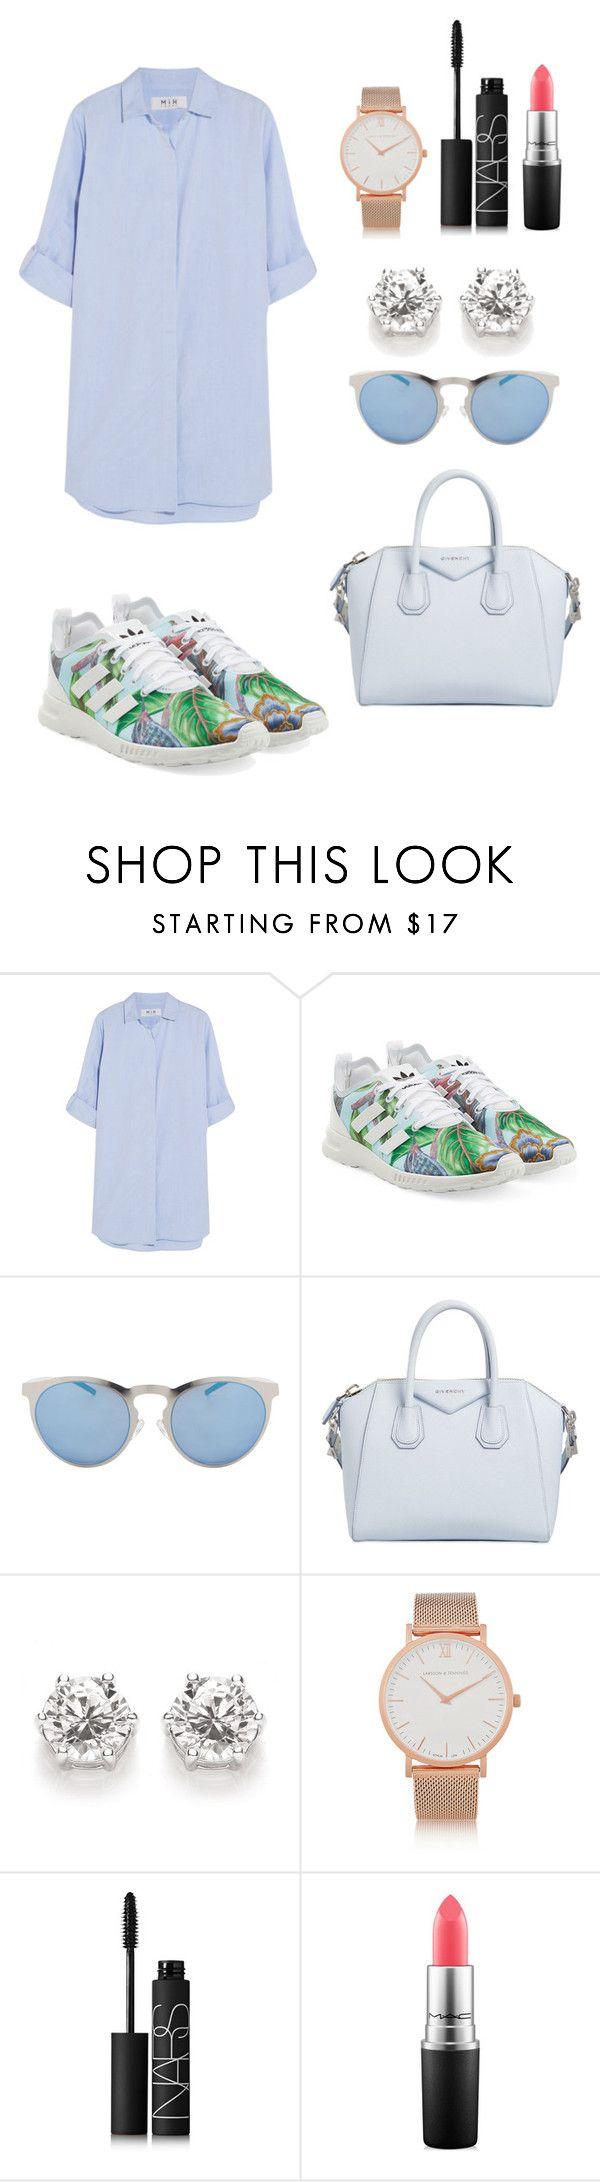 """Sin título #95"" by hannymontanita on Polyvore featuring moda, MiH Jeans, adidas Originals, Illesteva, Givenchy, Larsson & Jennings, NARS Cosmetics y MAC Cosmetics"